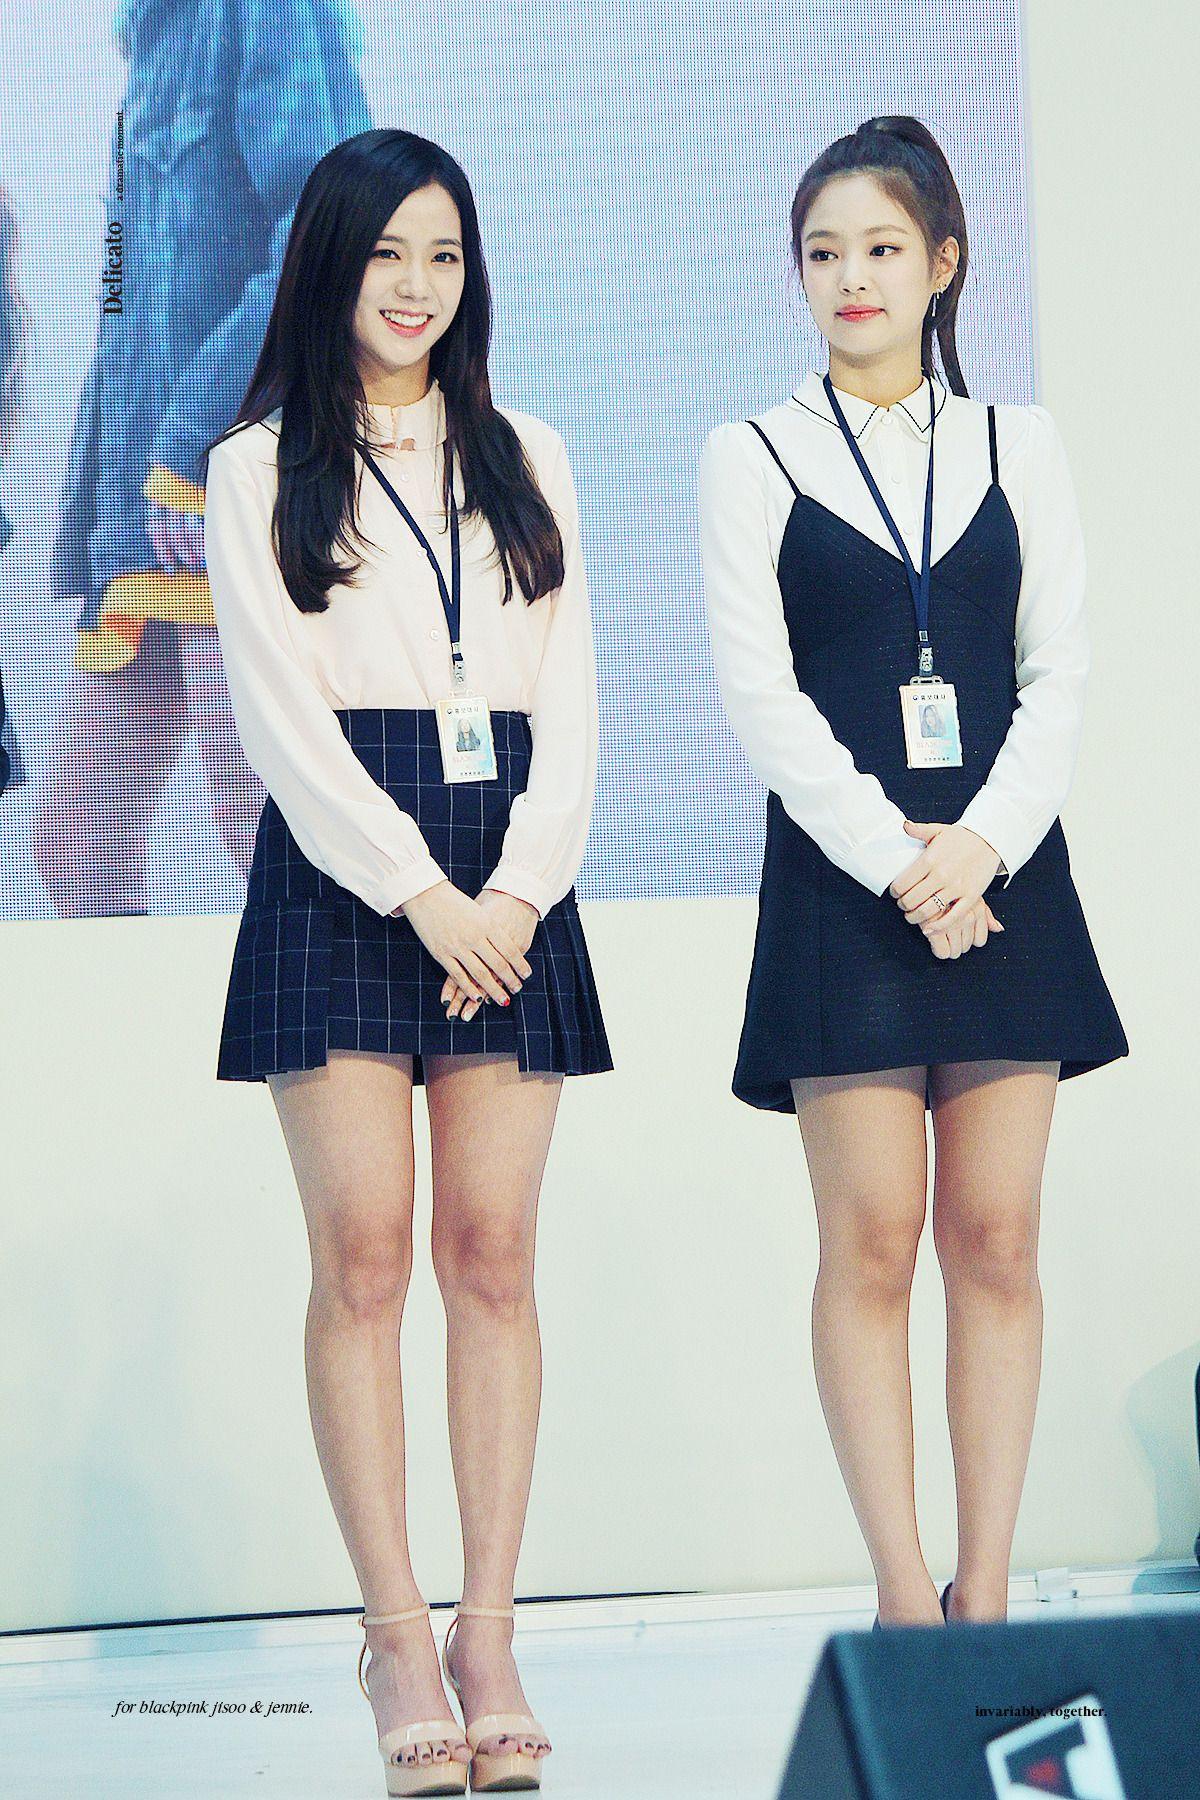 Kpop Profiles - Kpop band member profiles and Korean celebrity profiles